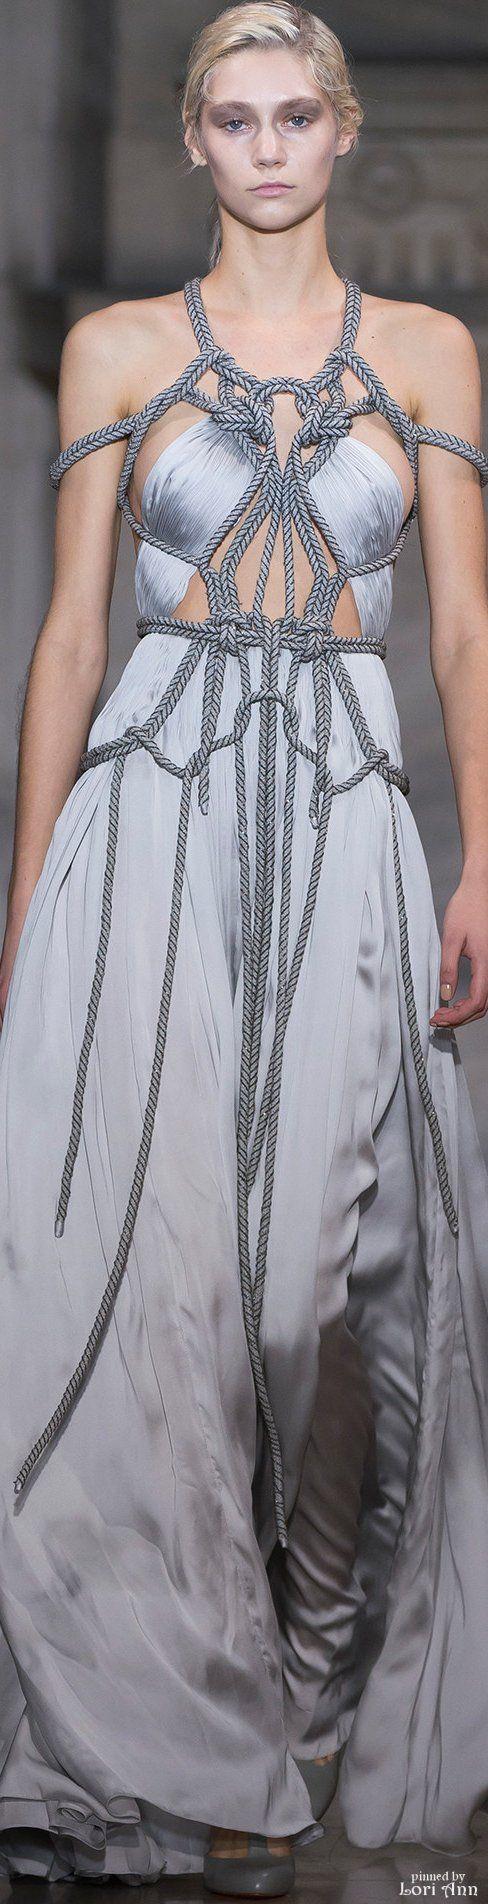 Yiqing Yin Couture Spring 2016///This is some Daenerys Targaryen shit right here.